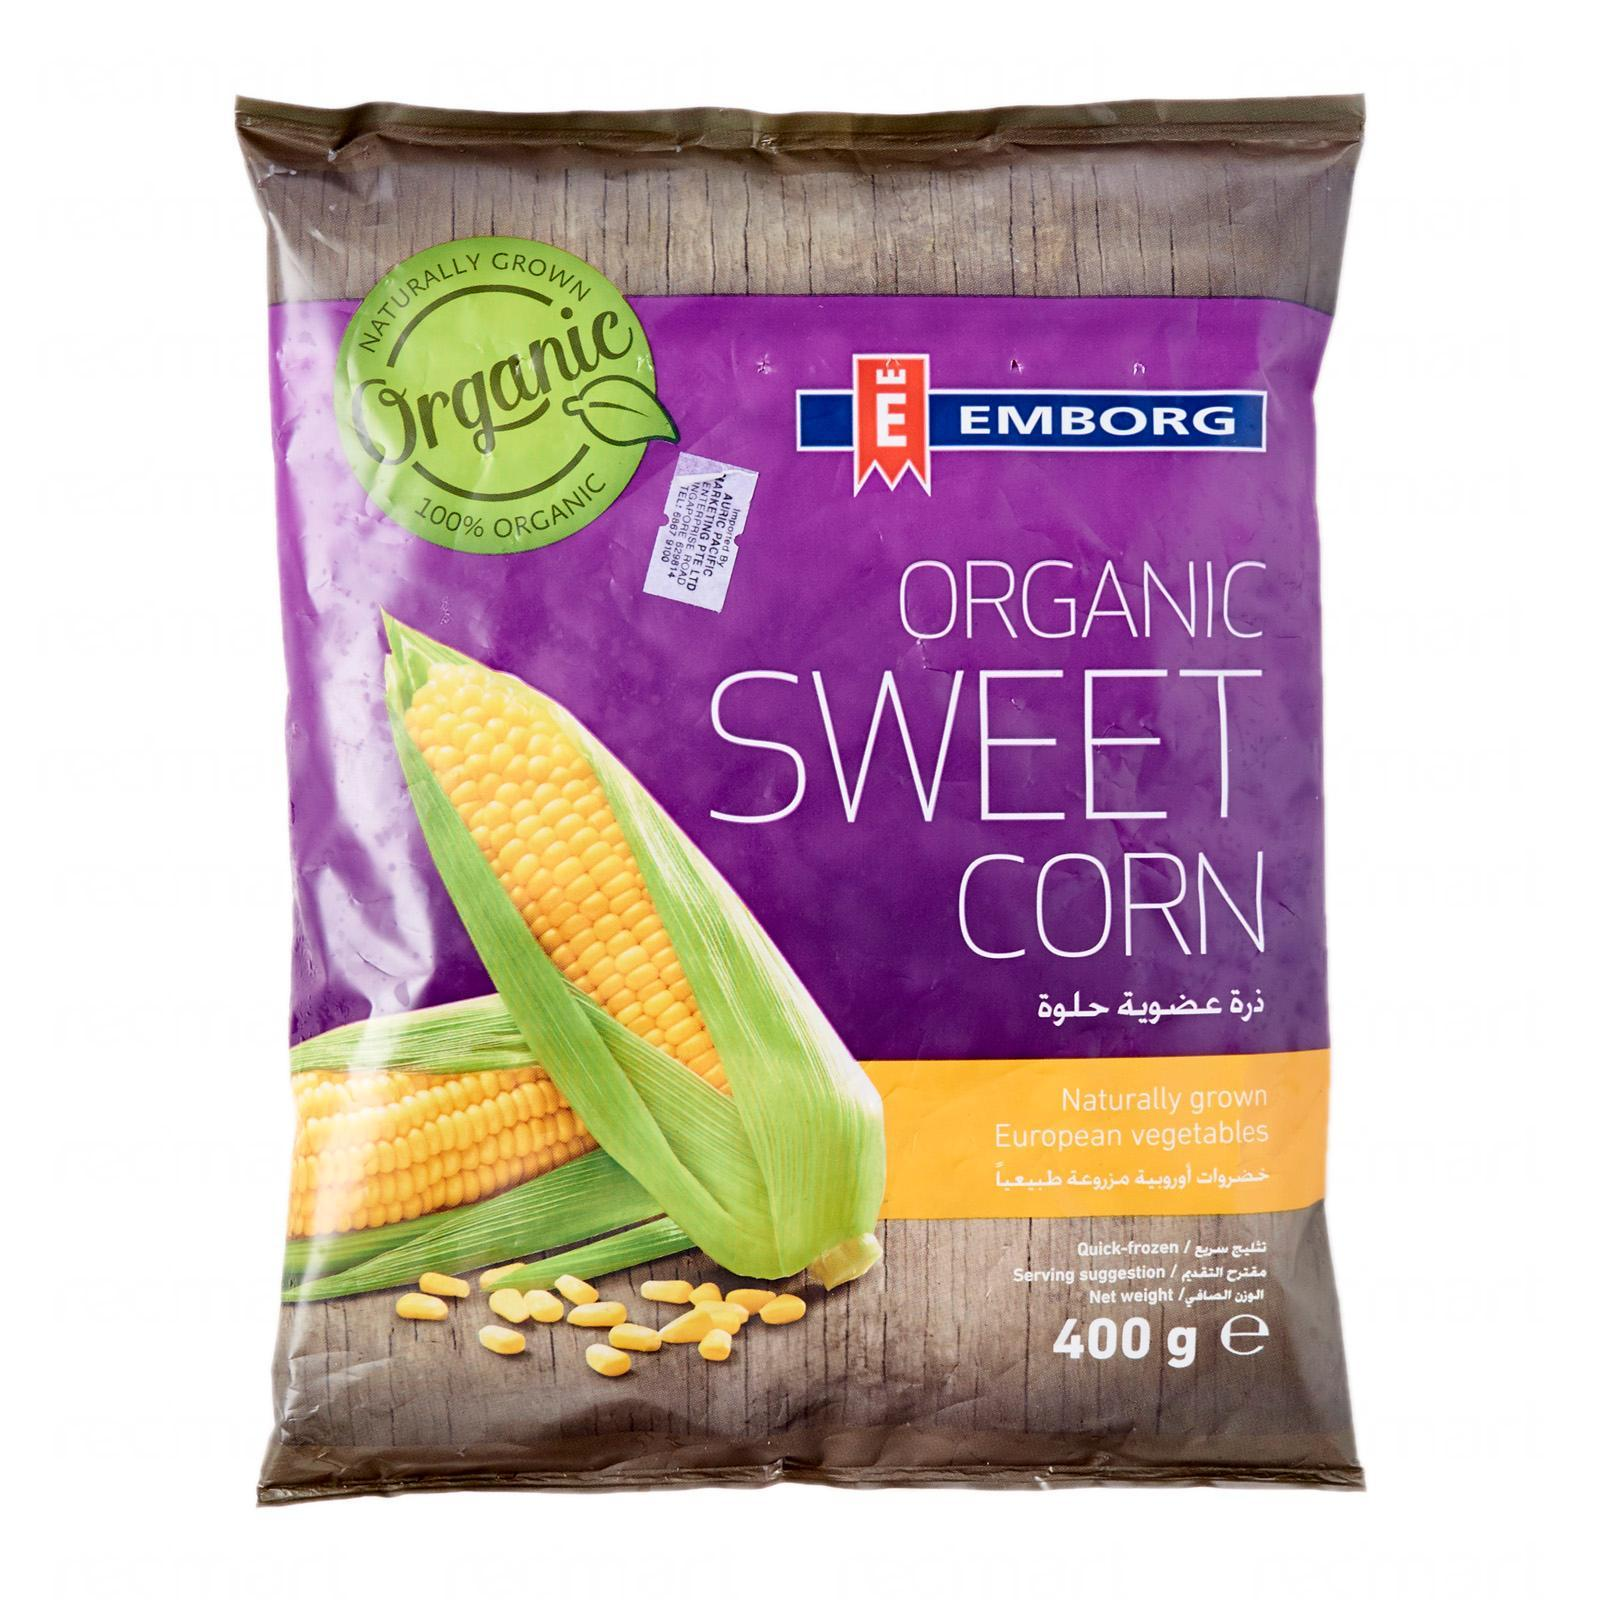 [expiring 9 June 2019] Emborg Organic Sweet Corn - Frozen By Redmart.